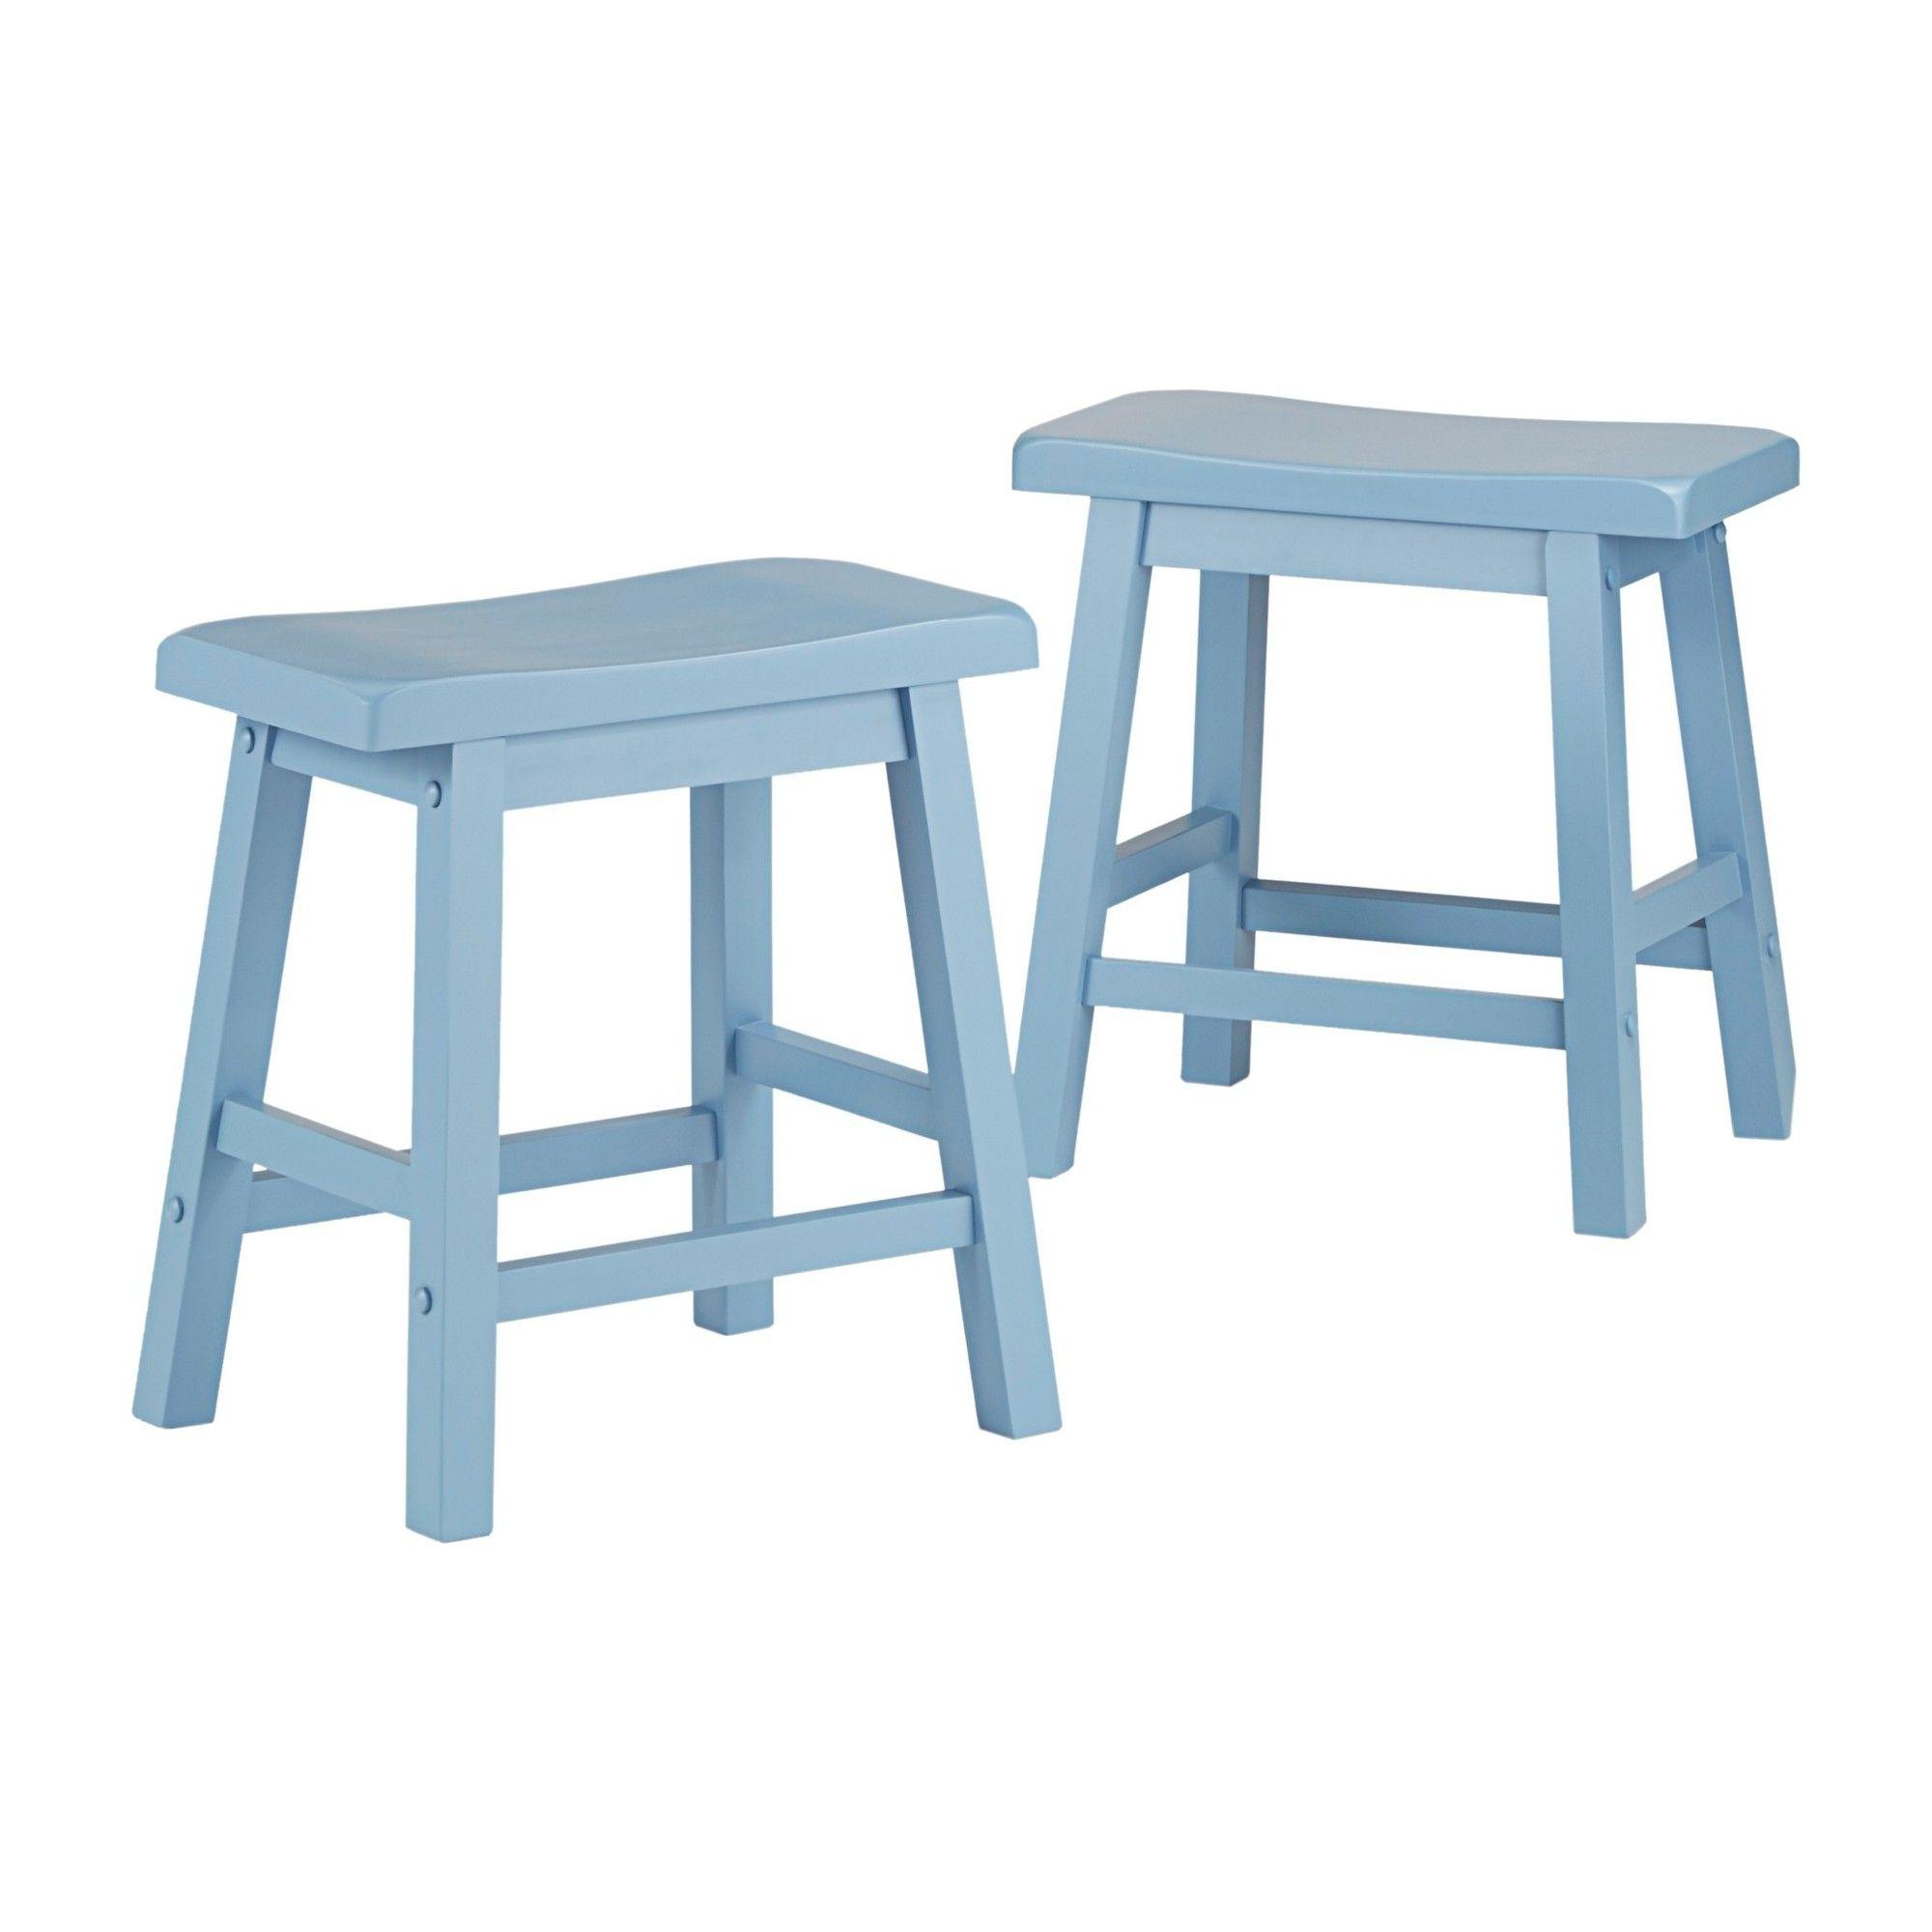 Fantastic Vinton 18 Saddle Stool Set Of 2 Blue Inspire Q Pdpeps Interior Chair Design Pdpepsorg